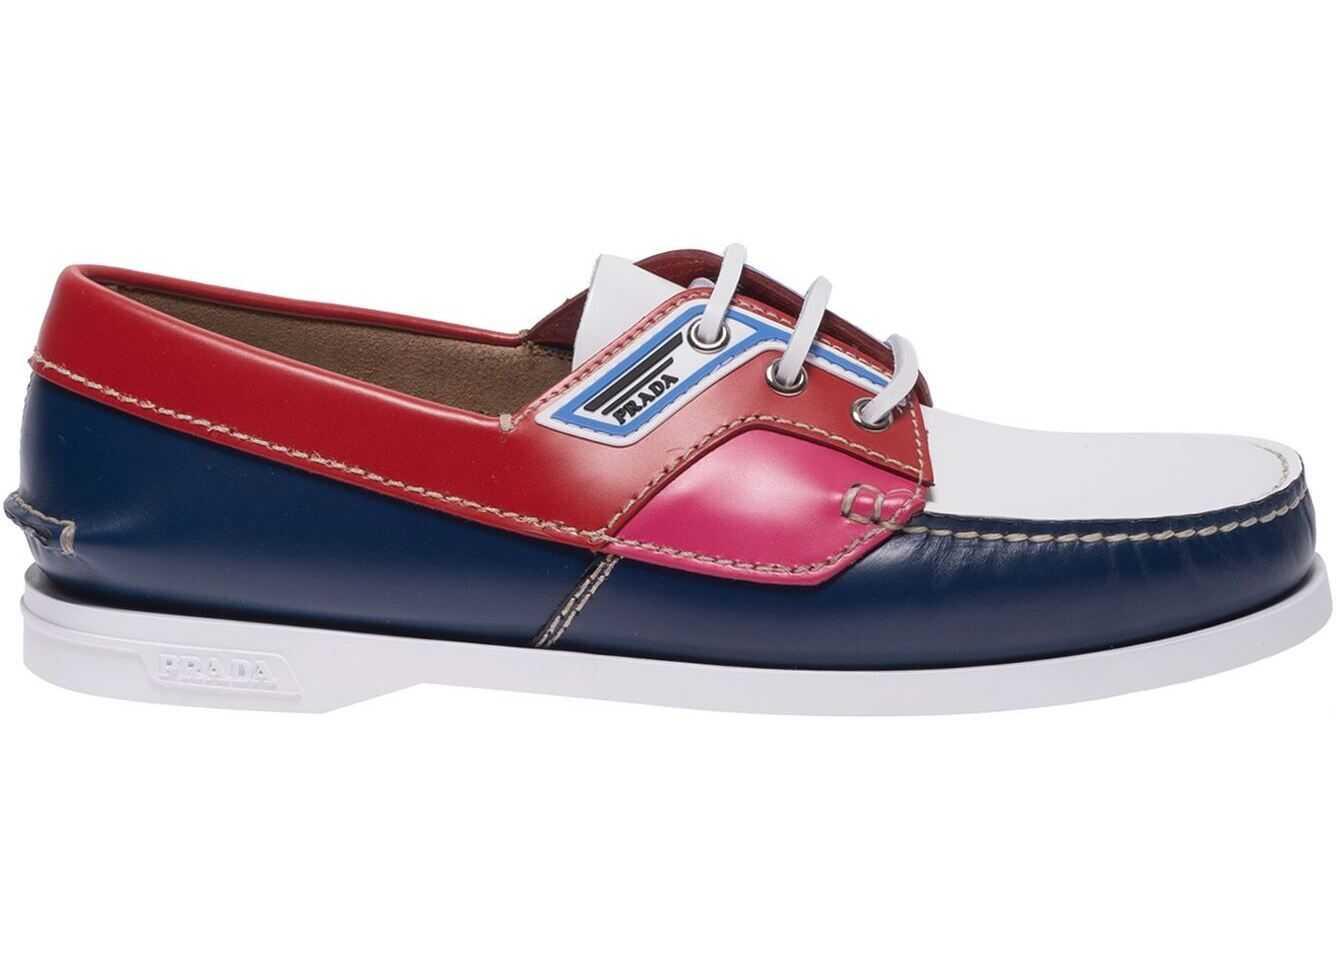 Prada Brushed Multicolor Leatherboat Shoes 2EG270 85M F0ASY Multi imagine b-mall.ro